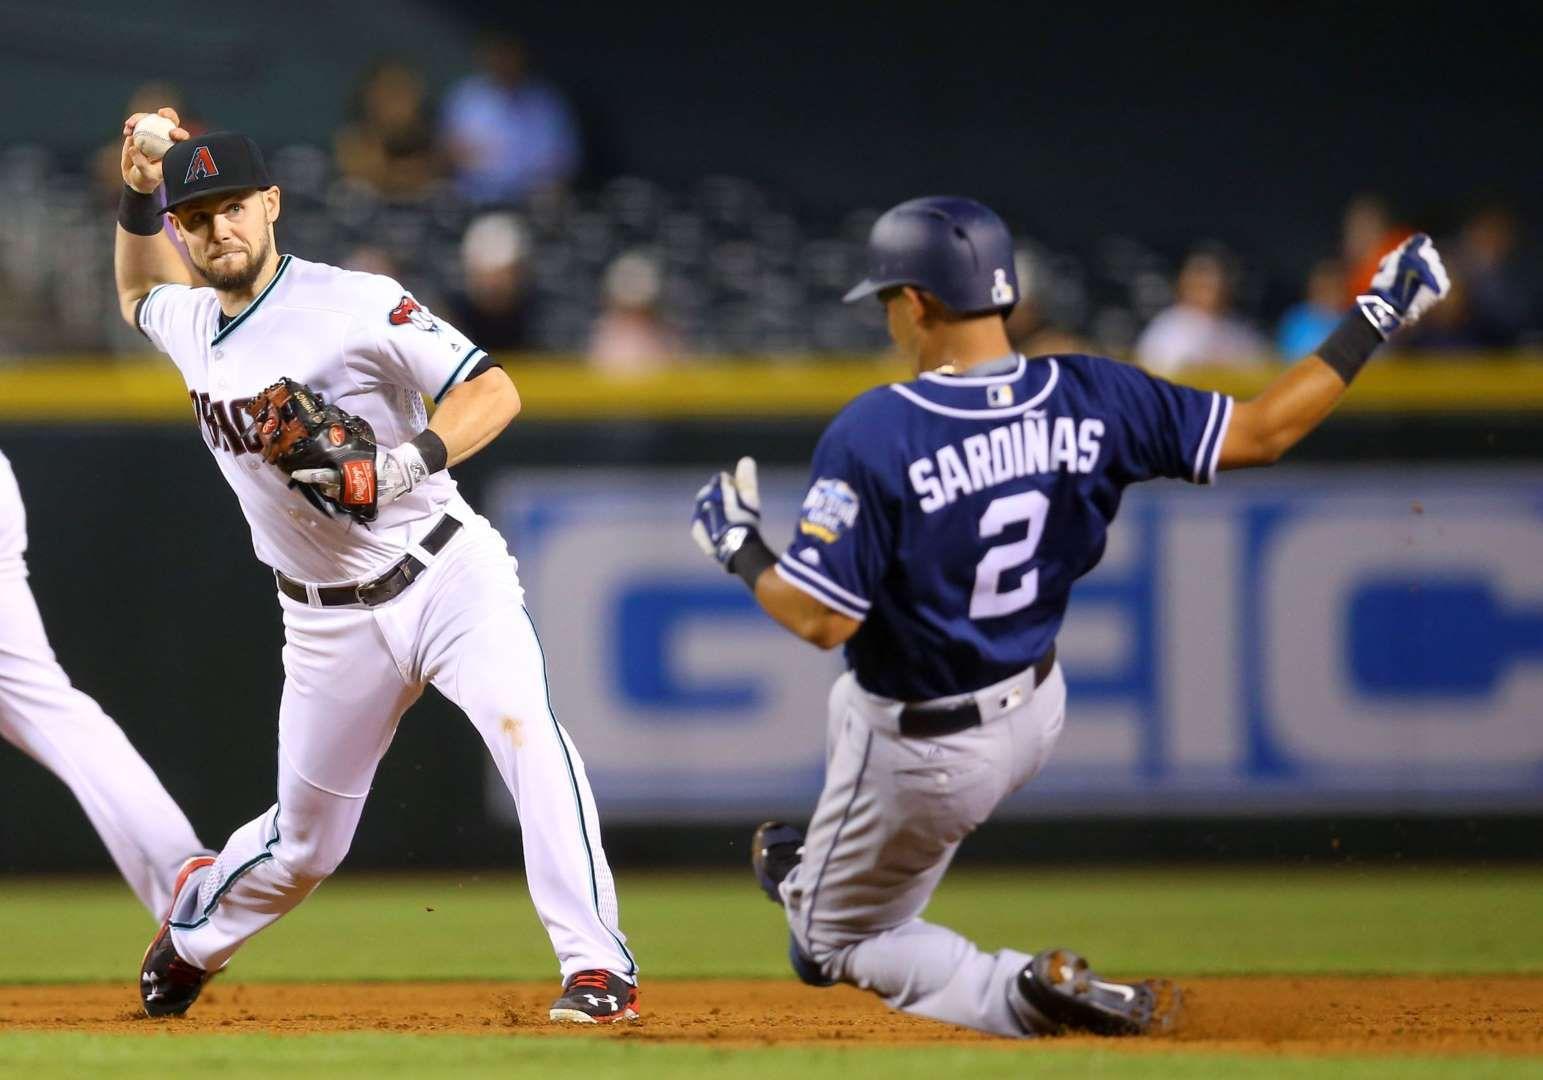 Padres V Diamondbacks Kevin French Icon Sportswire Getty Images Major League Baseball Baseball Major League